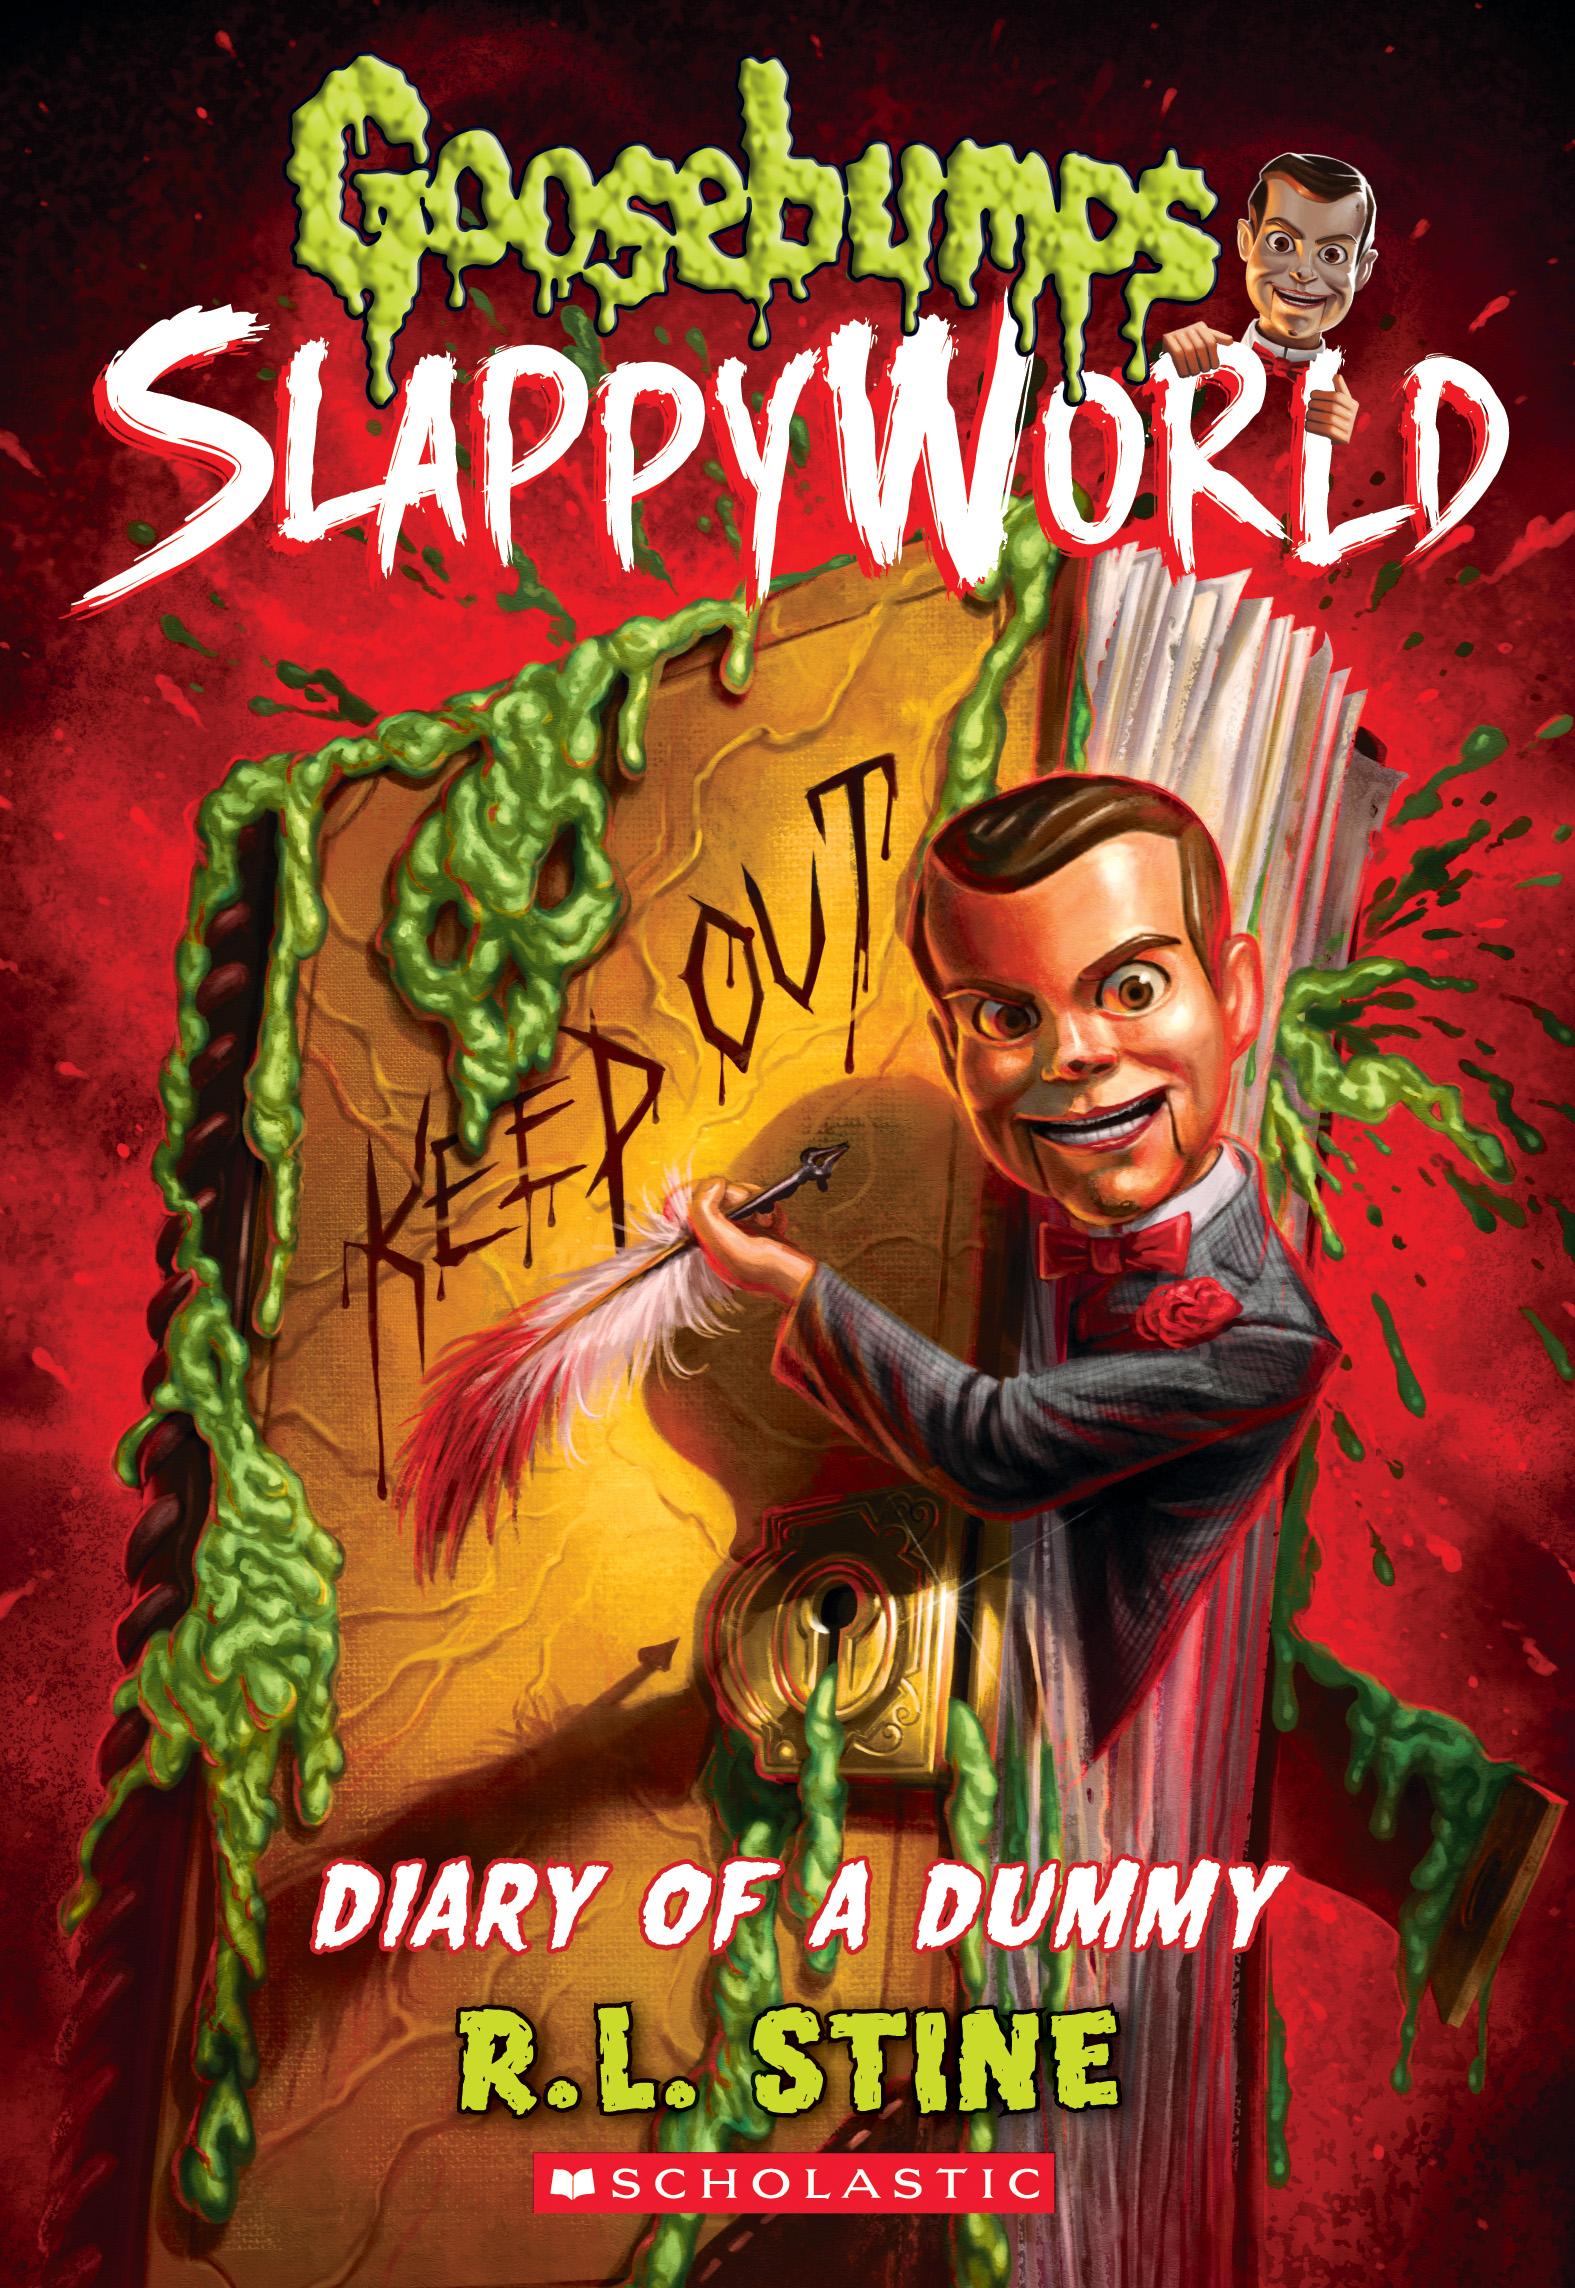 Diary of a Dummy (Goosebumps SlappyWorld, #10)